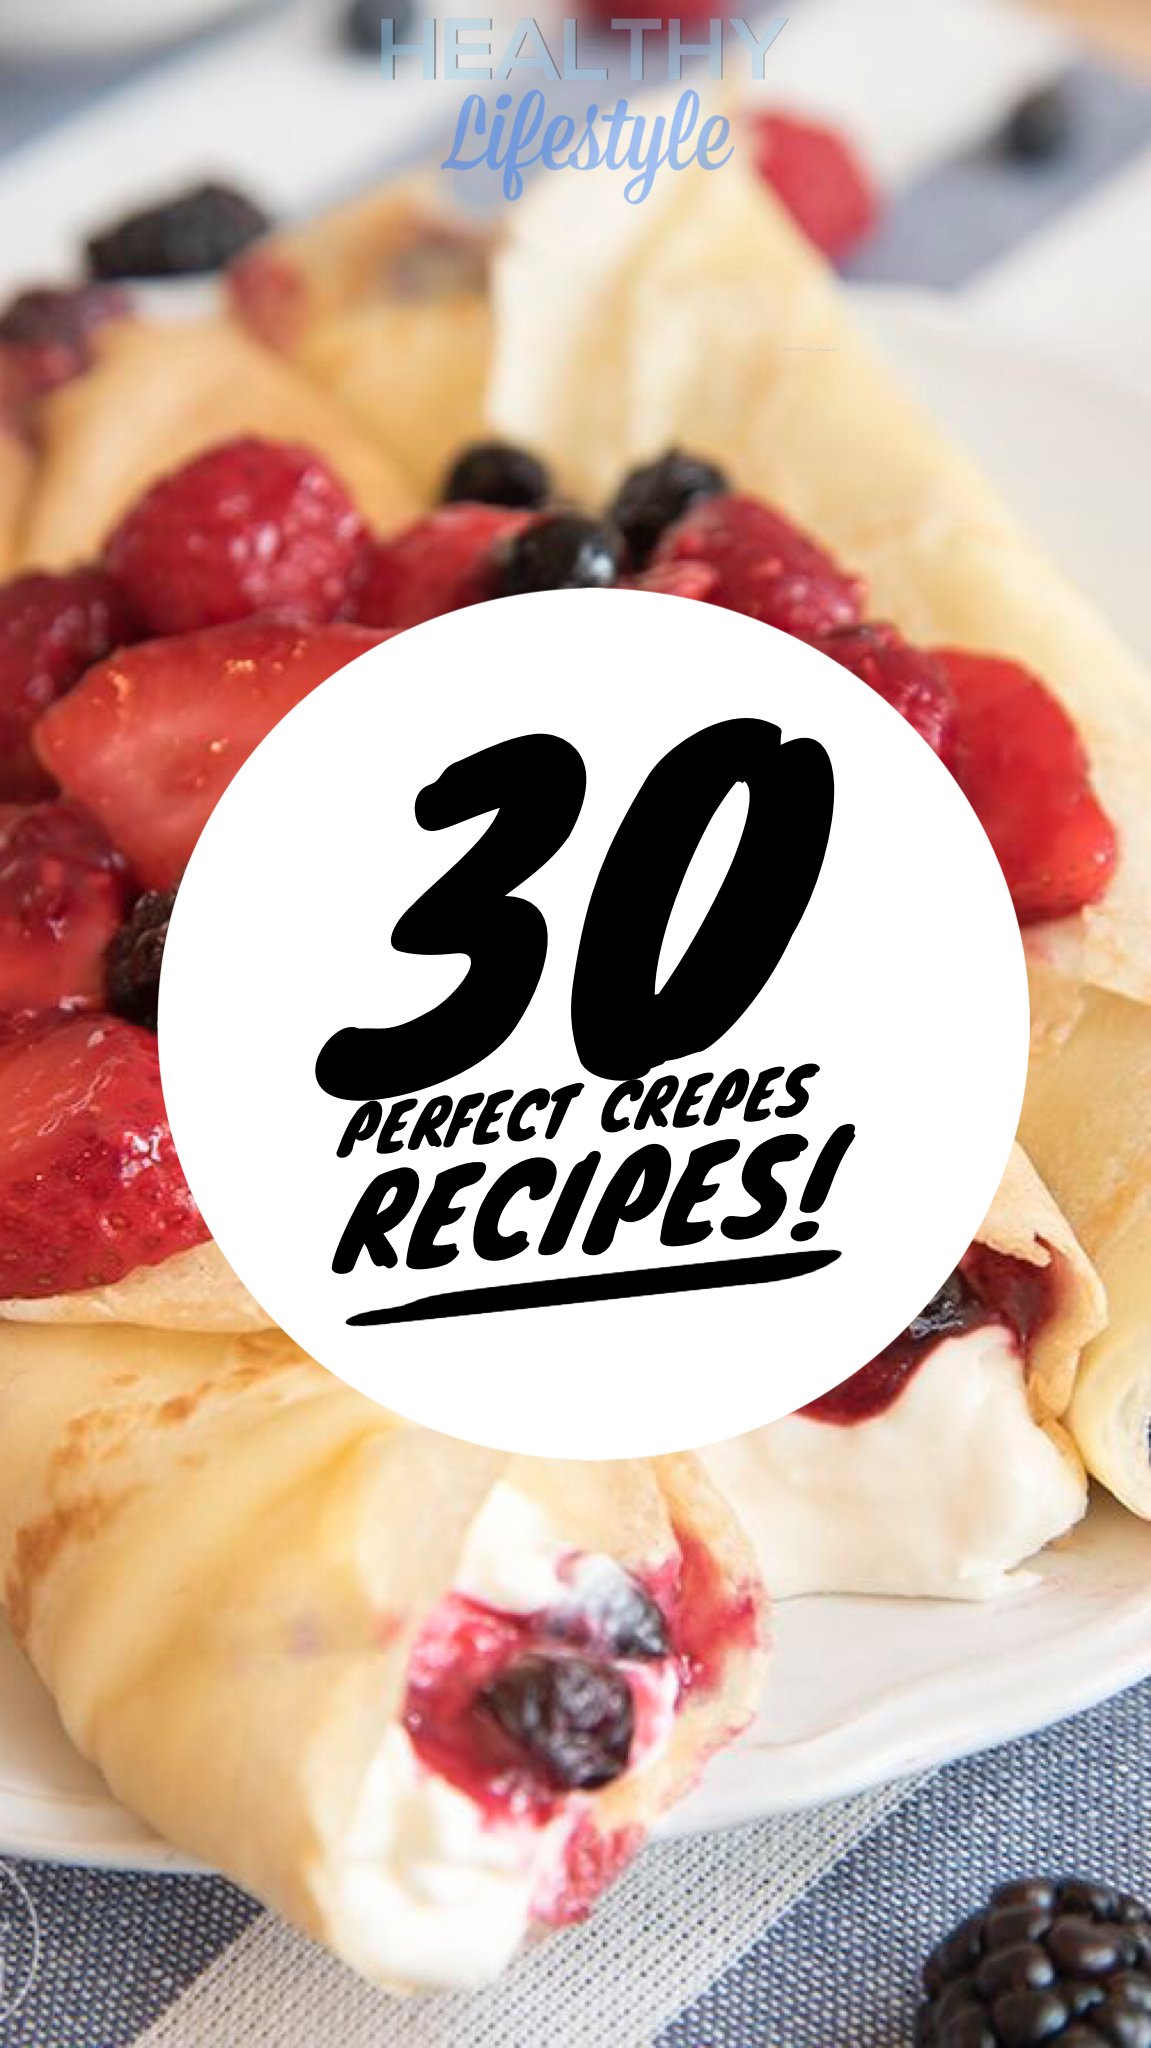 30 perfect crepes recipes Dessert food Healthy